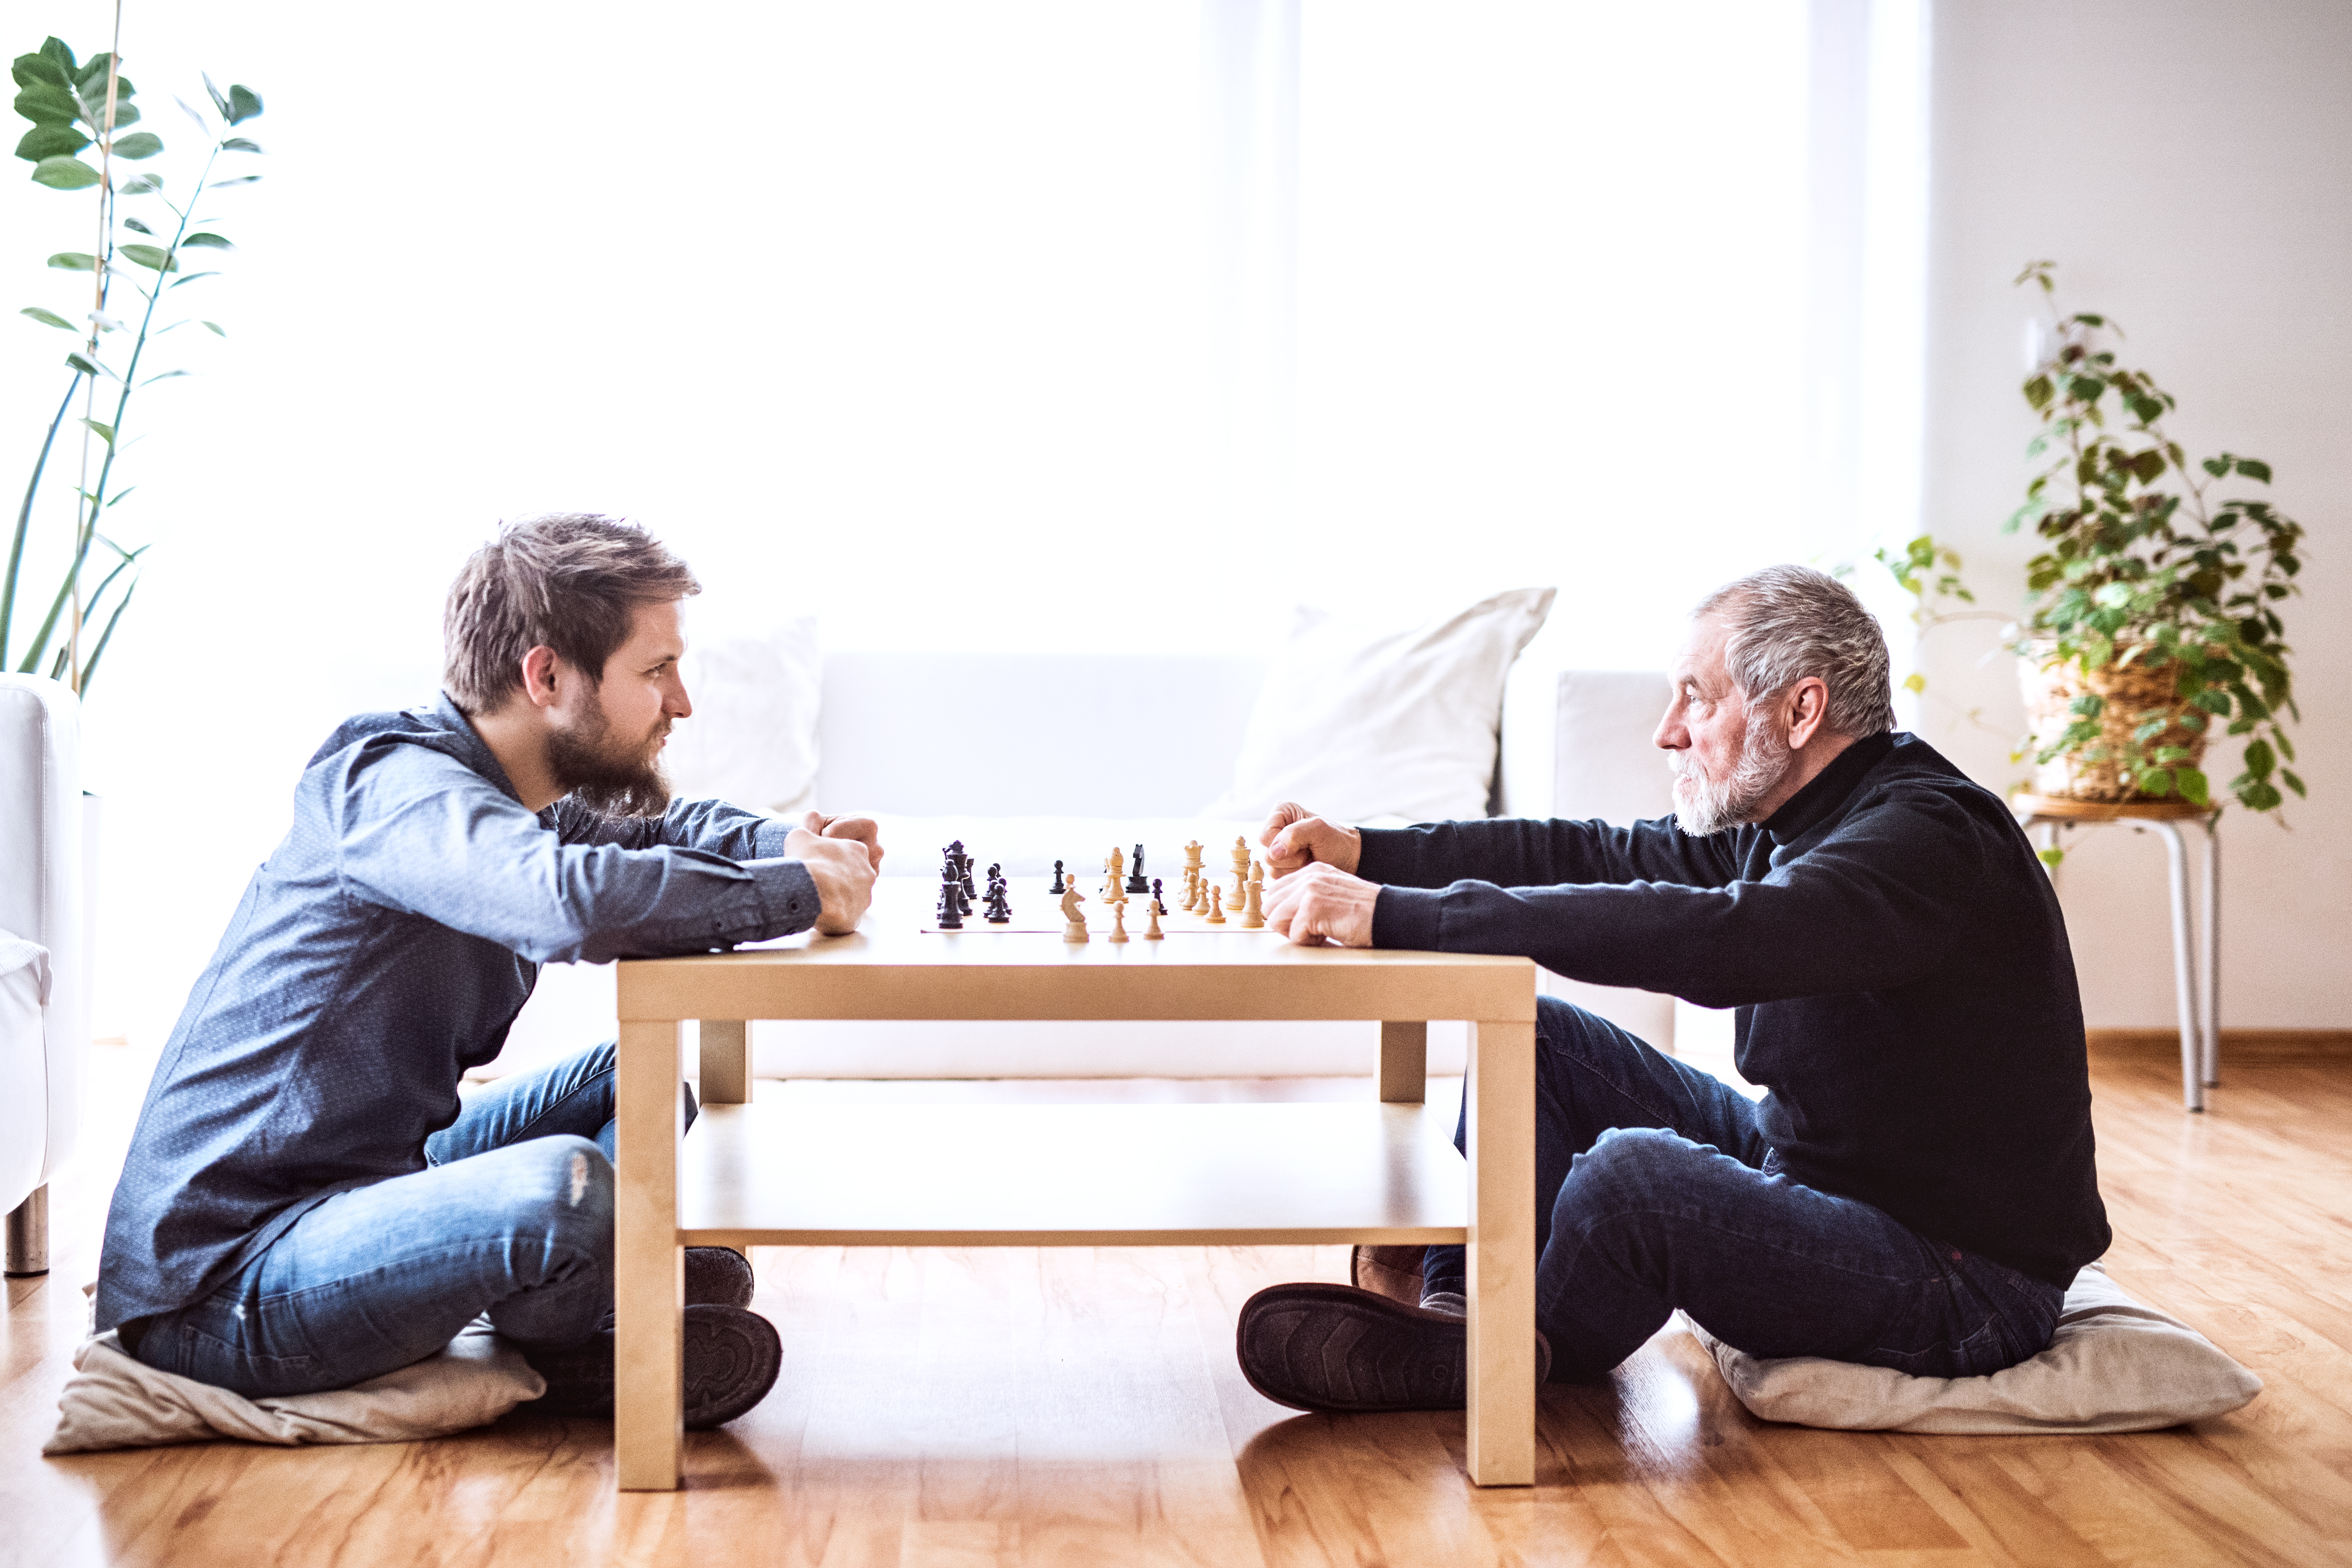 Board games keep seniors minds engaged